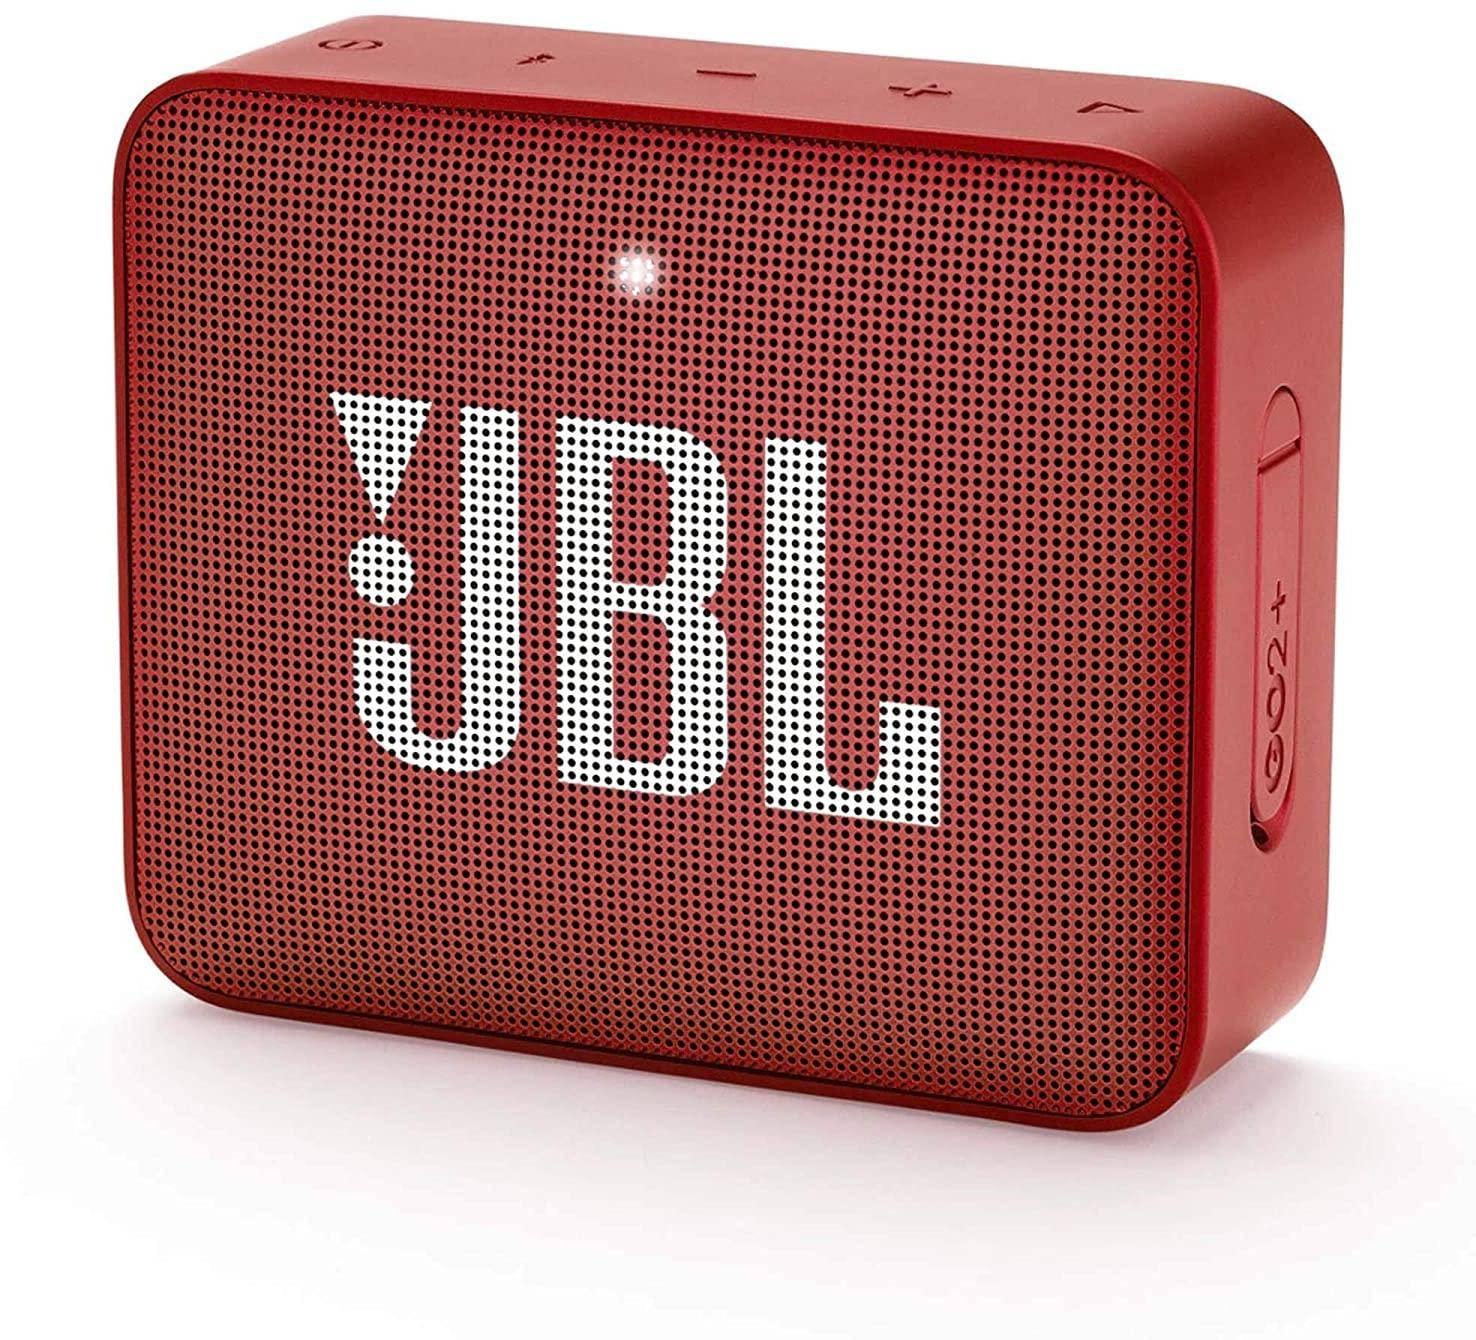 JBL Go 2 Plus Portable Wireless Speaker with Inbuilt Microphone zoom image